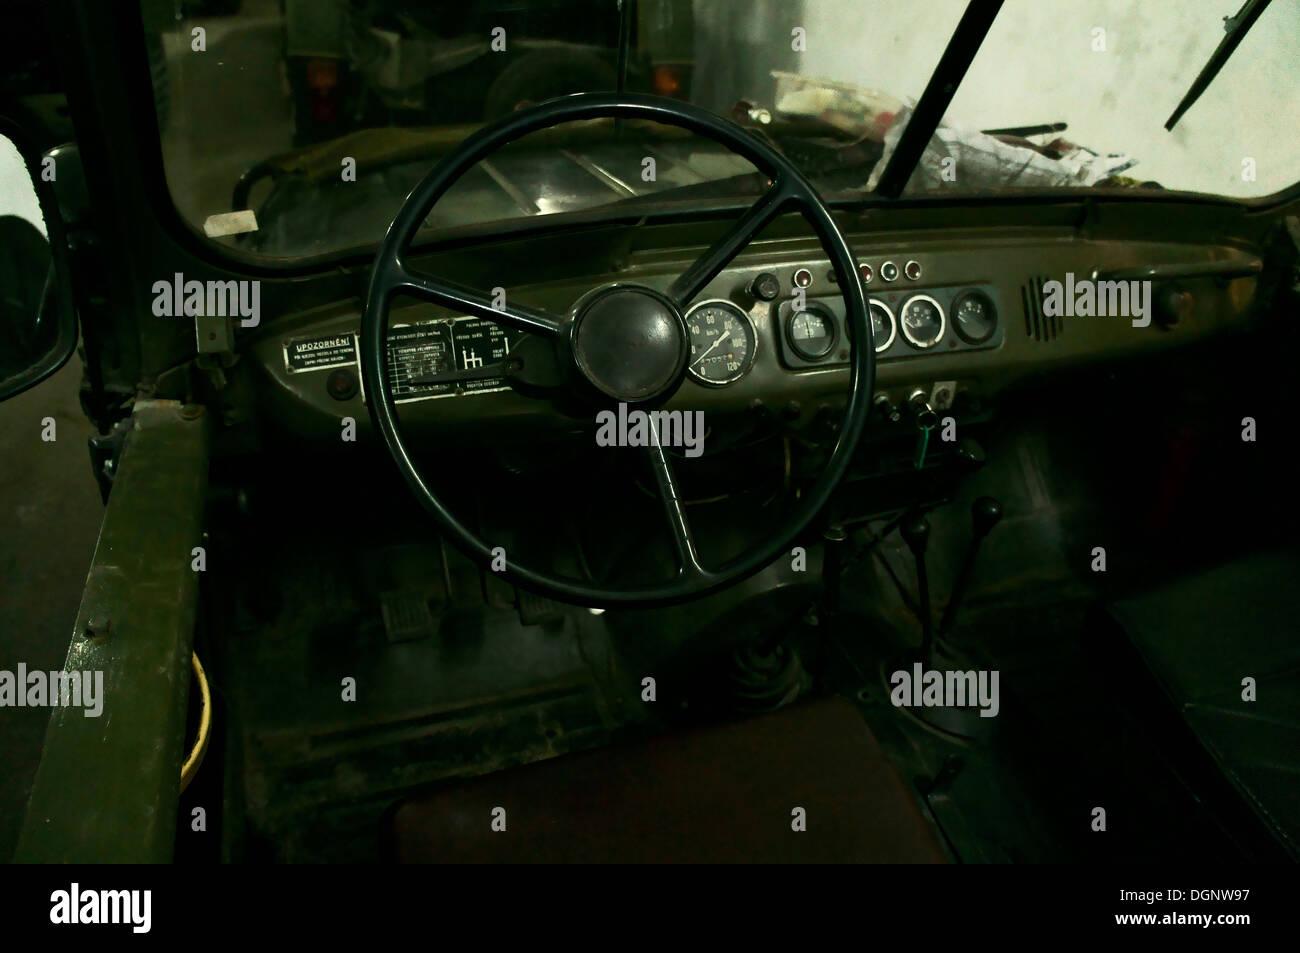 all Terrain Fahrzeug UAZ 469, Interieur, Lenkrad Stockfoto, Bild ...